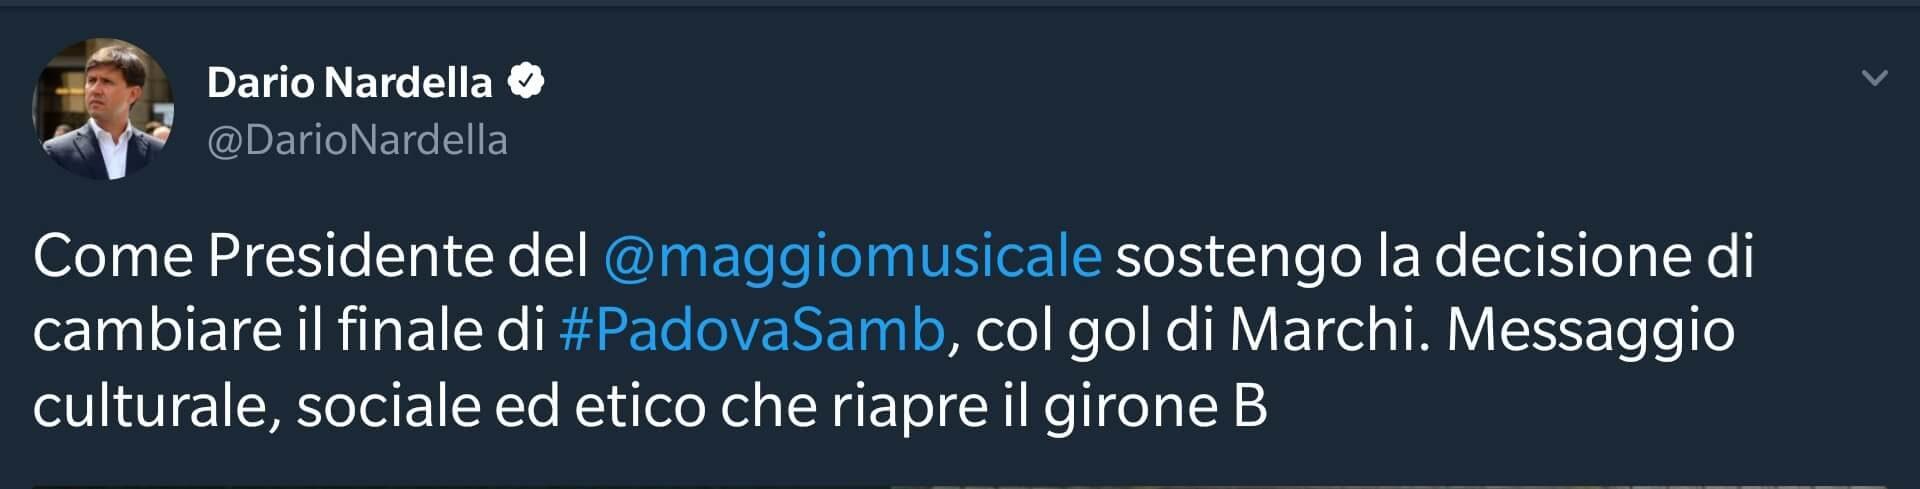 Padova-Samb Nardella